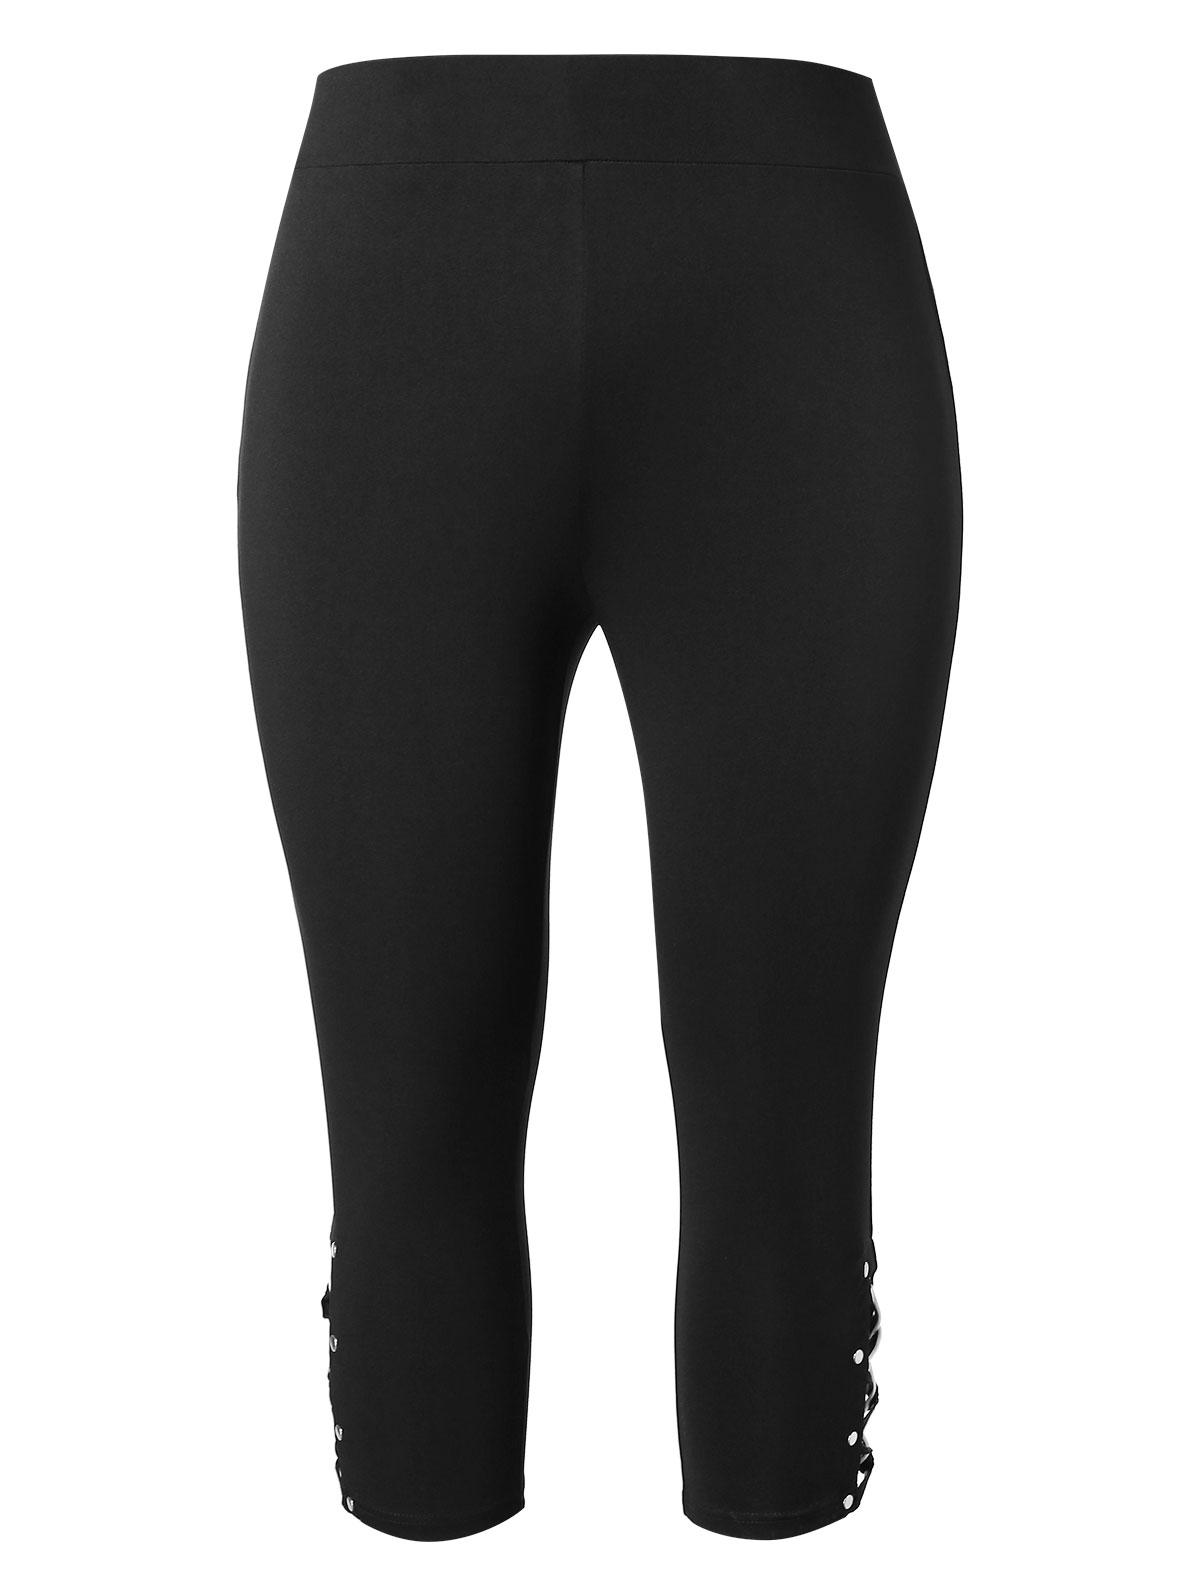 Sexy Locker Womens Compression Leggings Sport Running